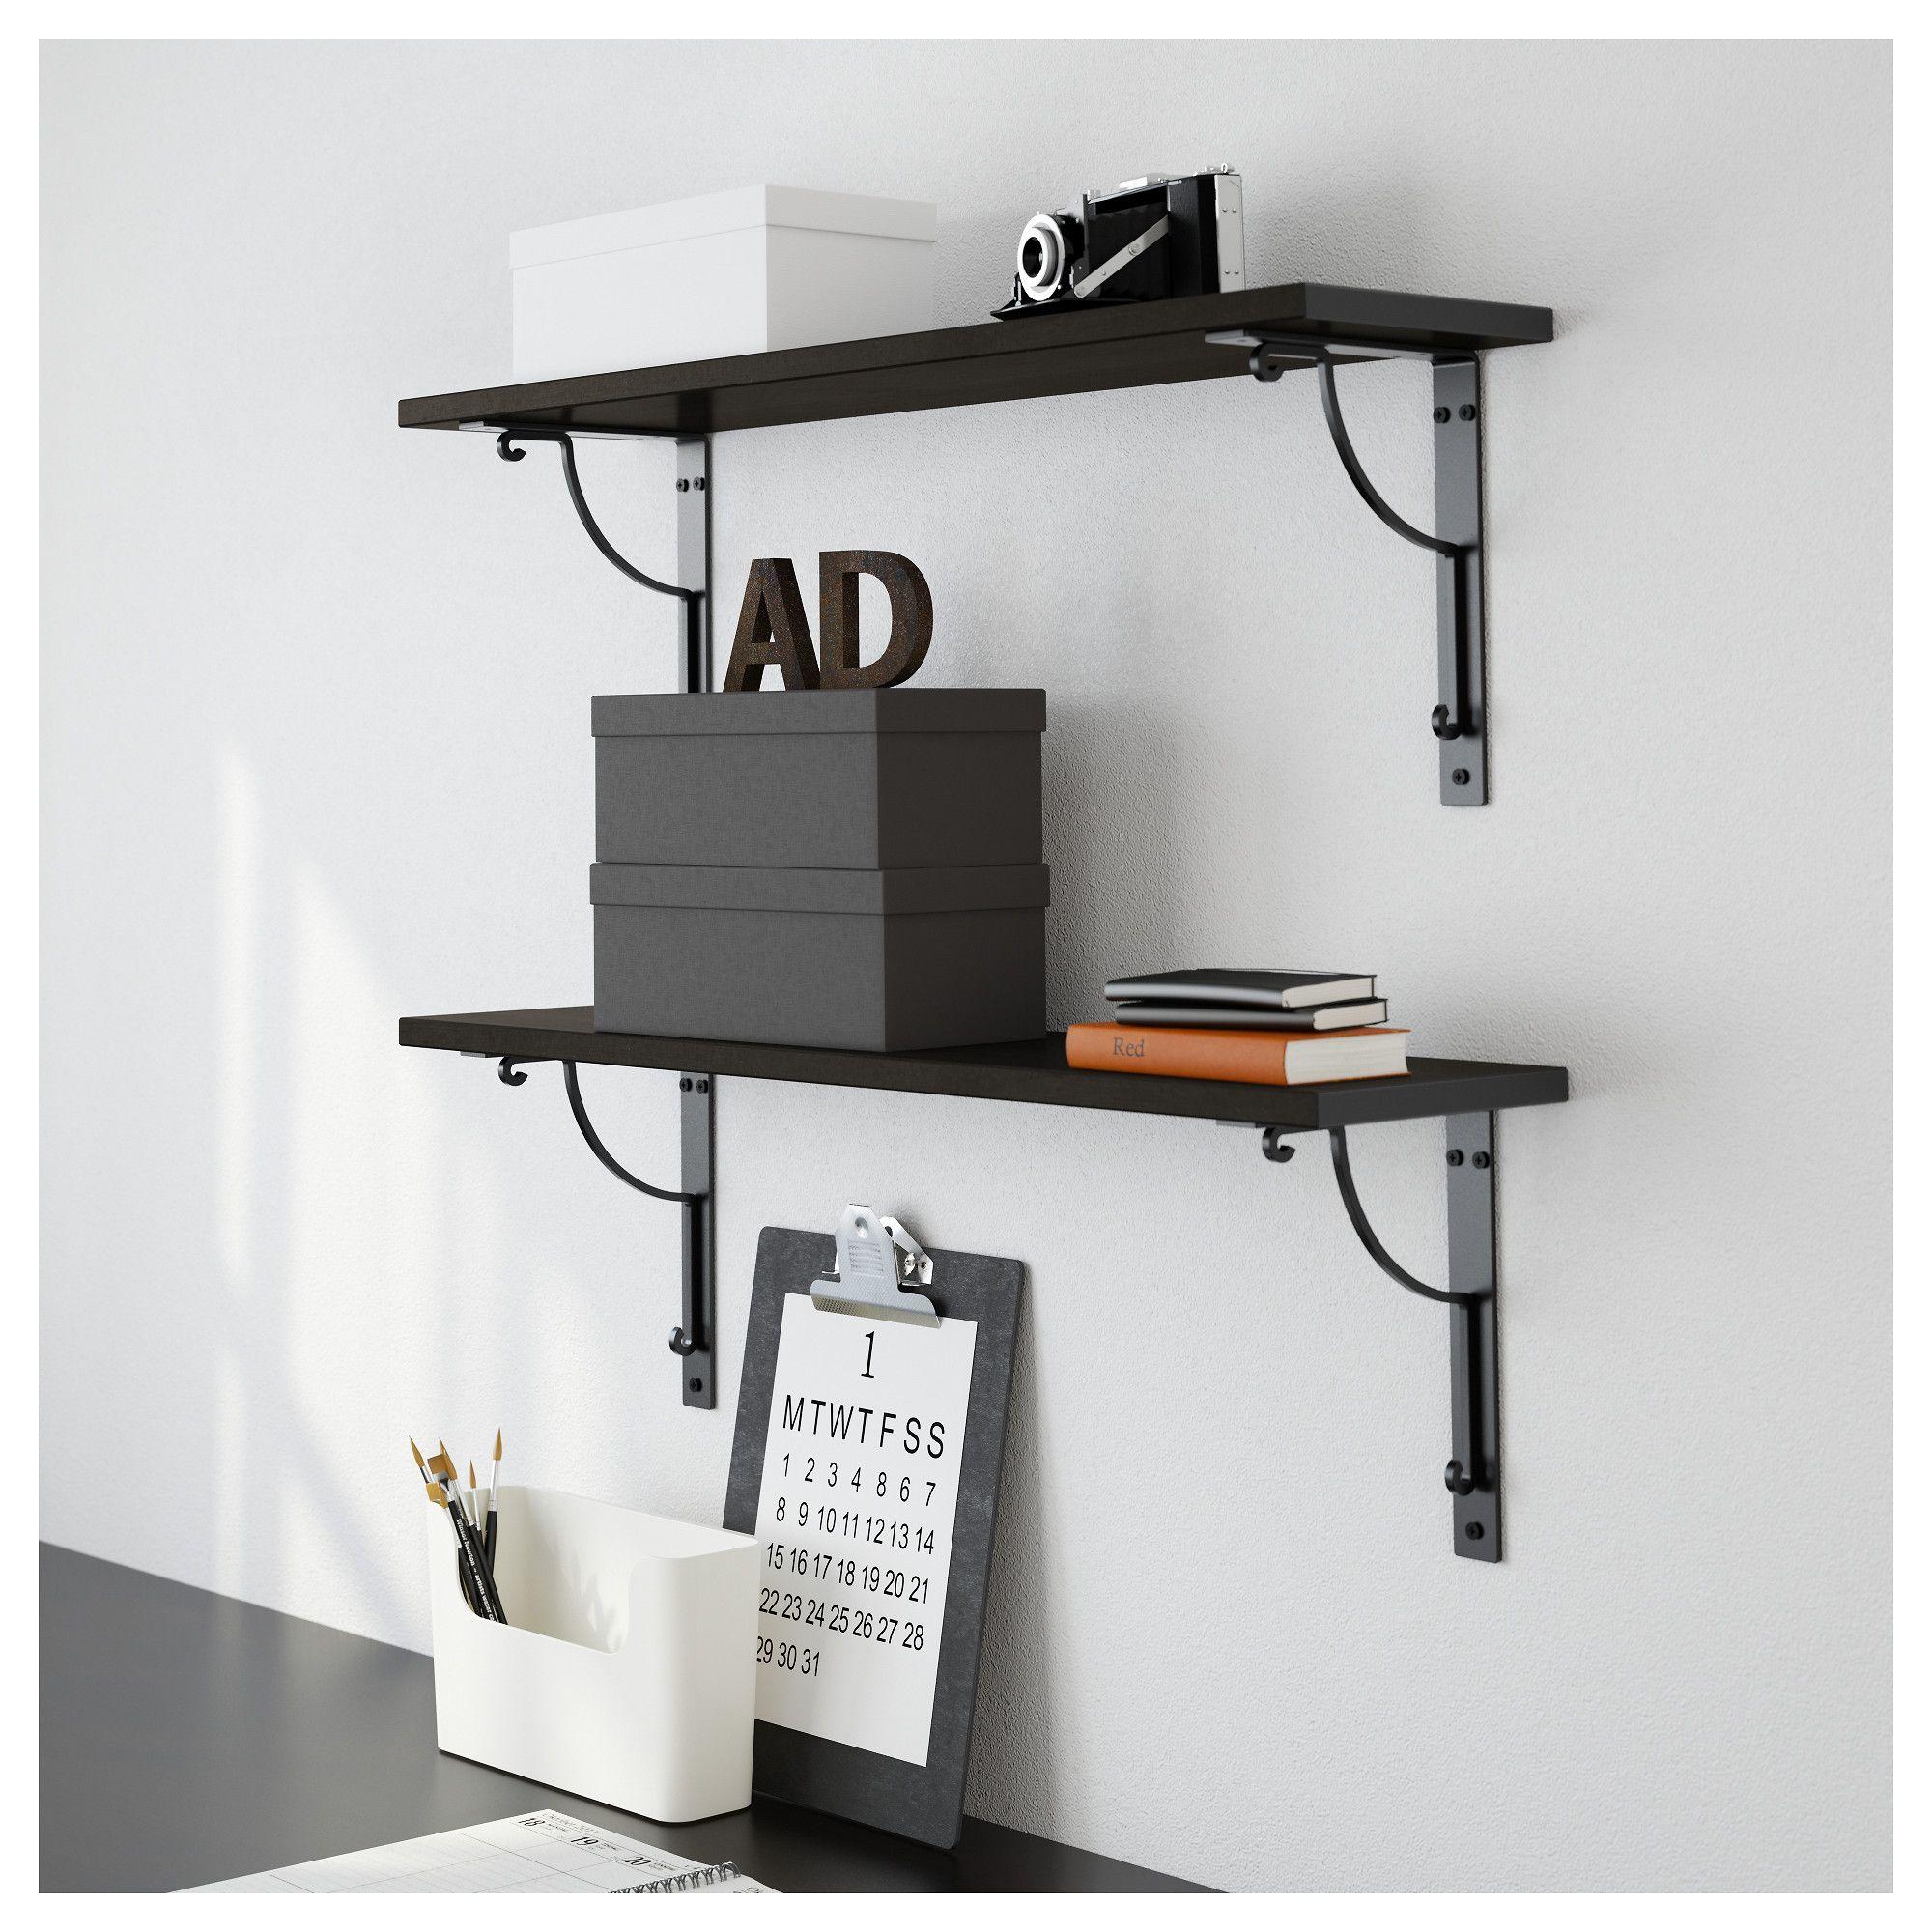 Furniture And Home Furnishings Ikea Wall Shelves Shelves Wall Shelves